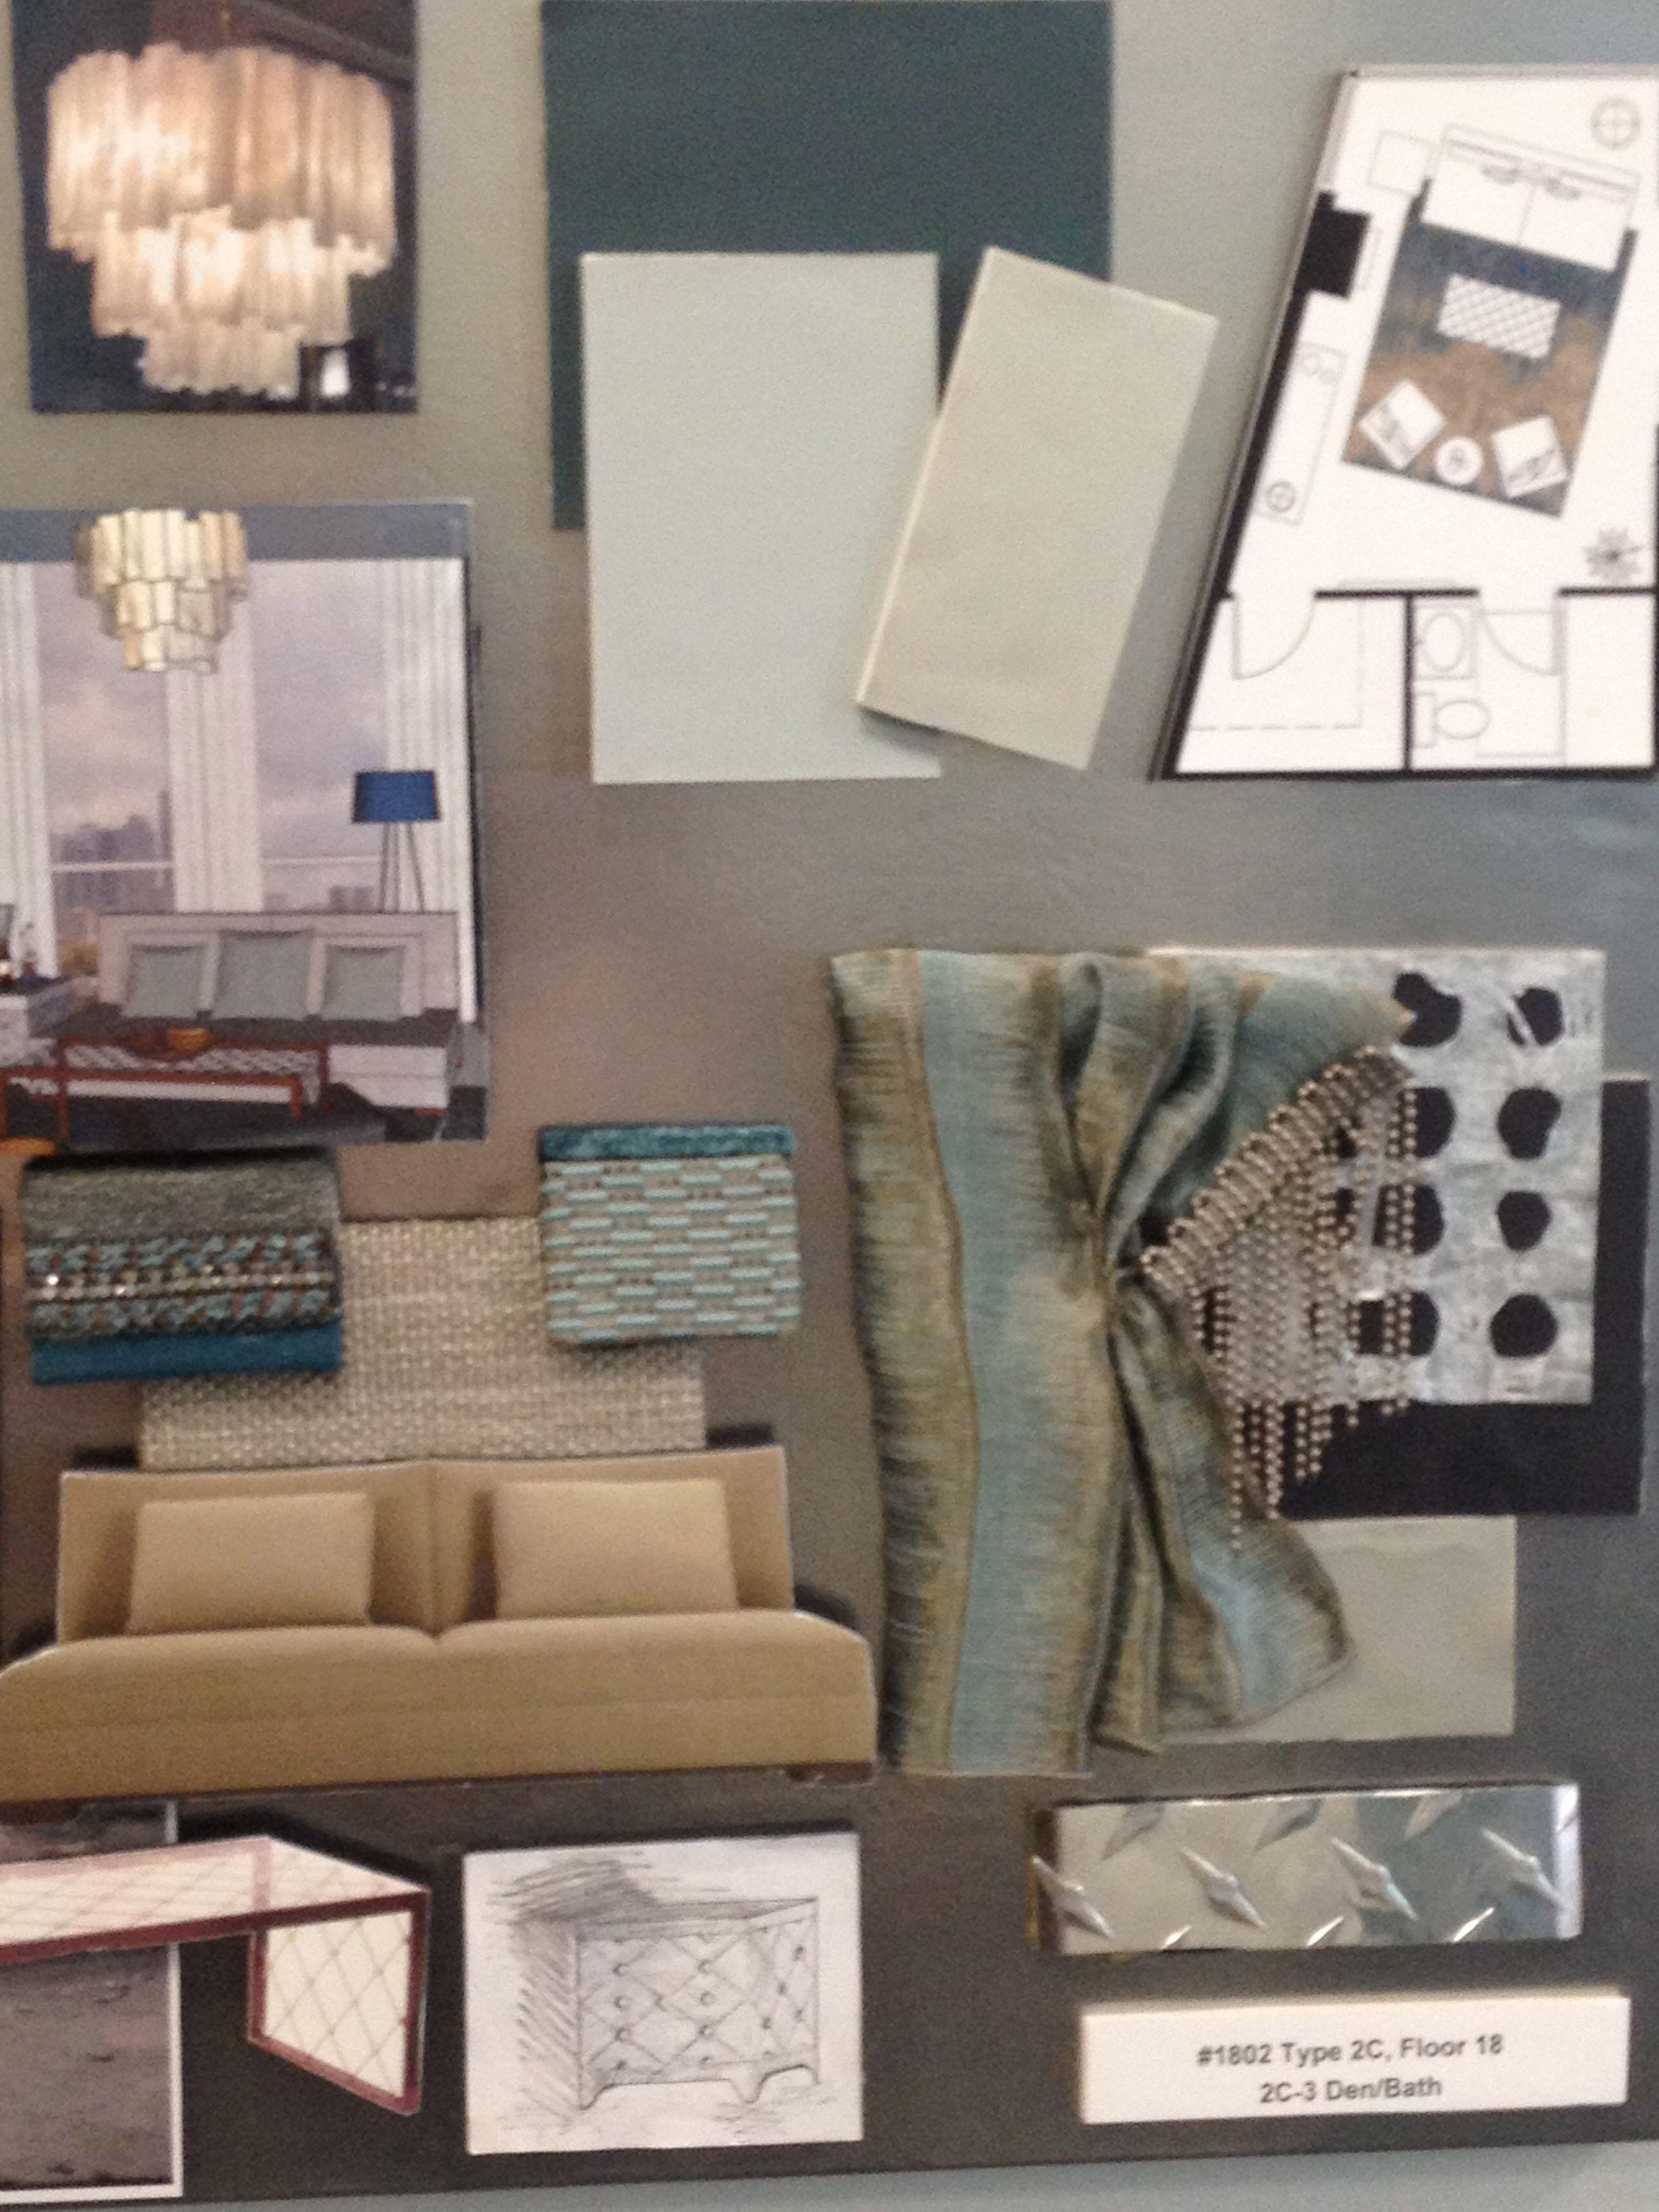 Design Concept Board Concept Design Diploma Design Concept Board